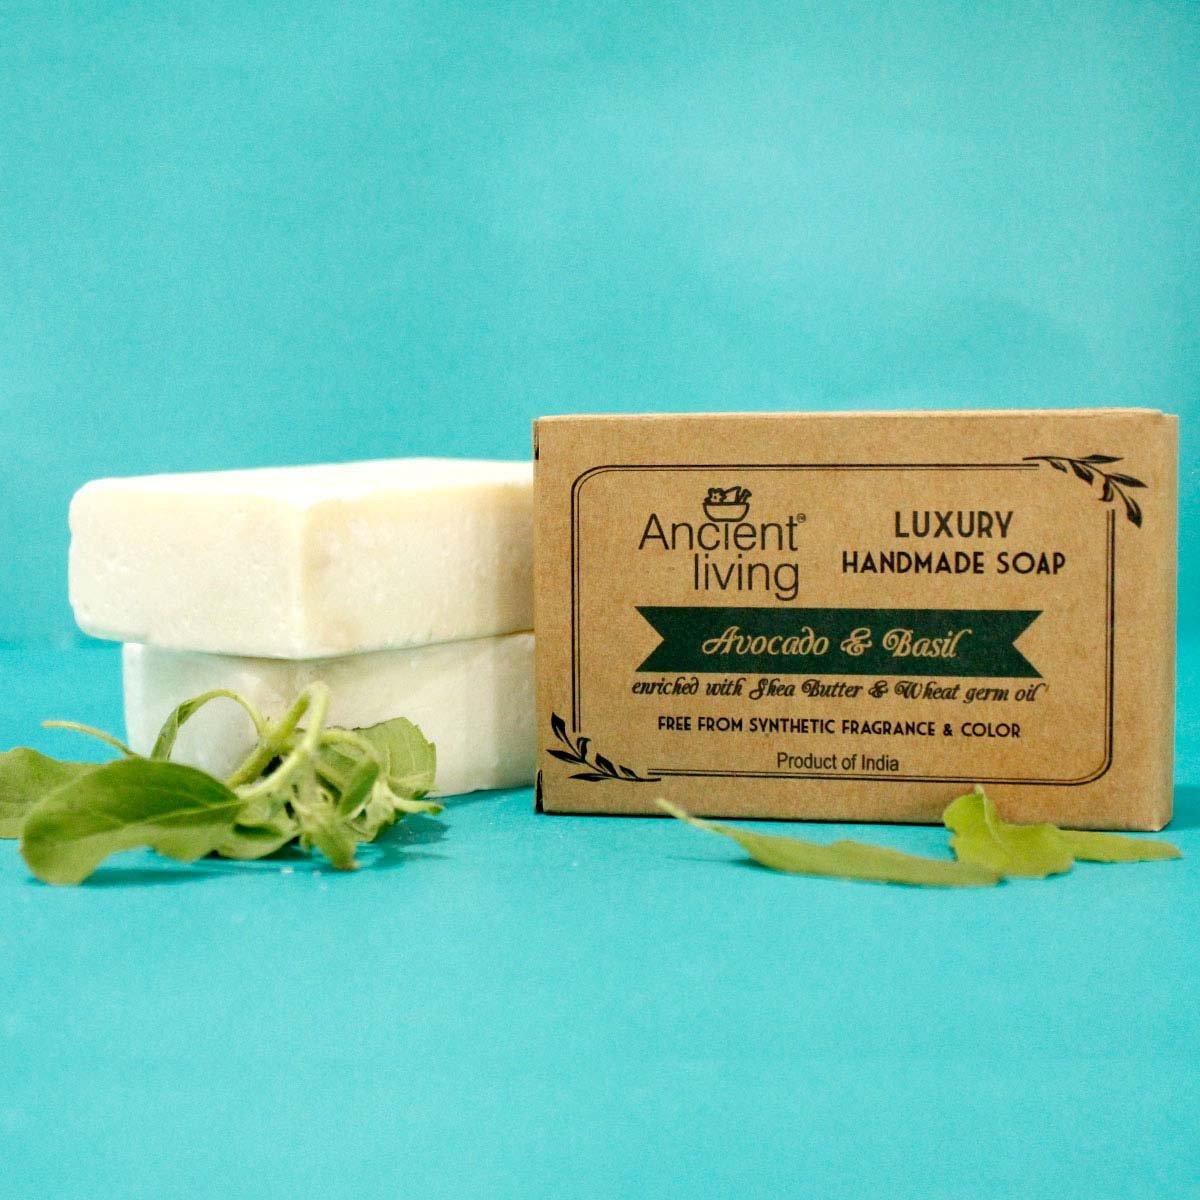 Avocado & Basil Handmade Soap